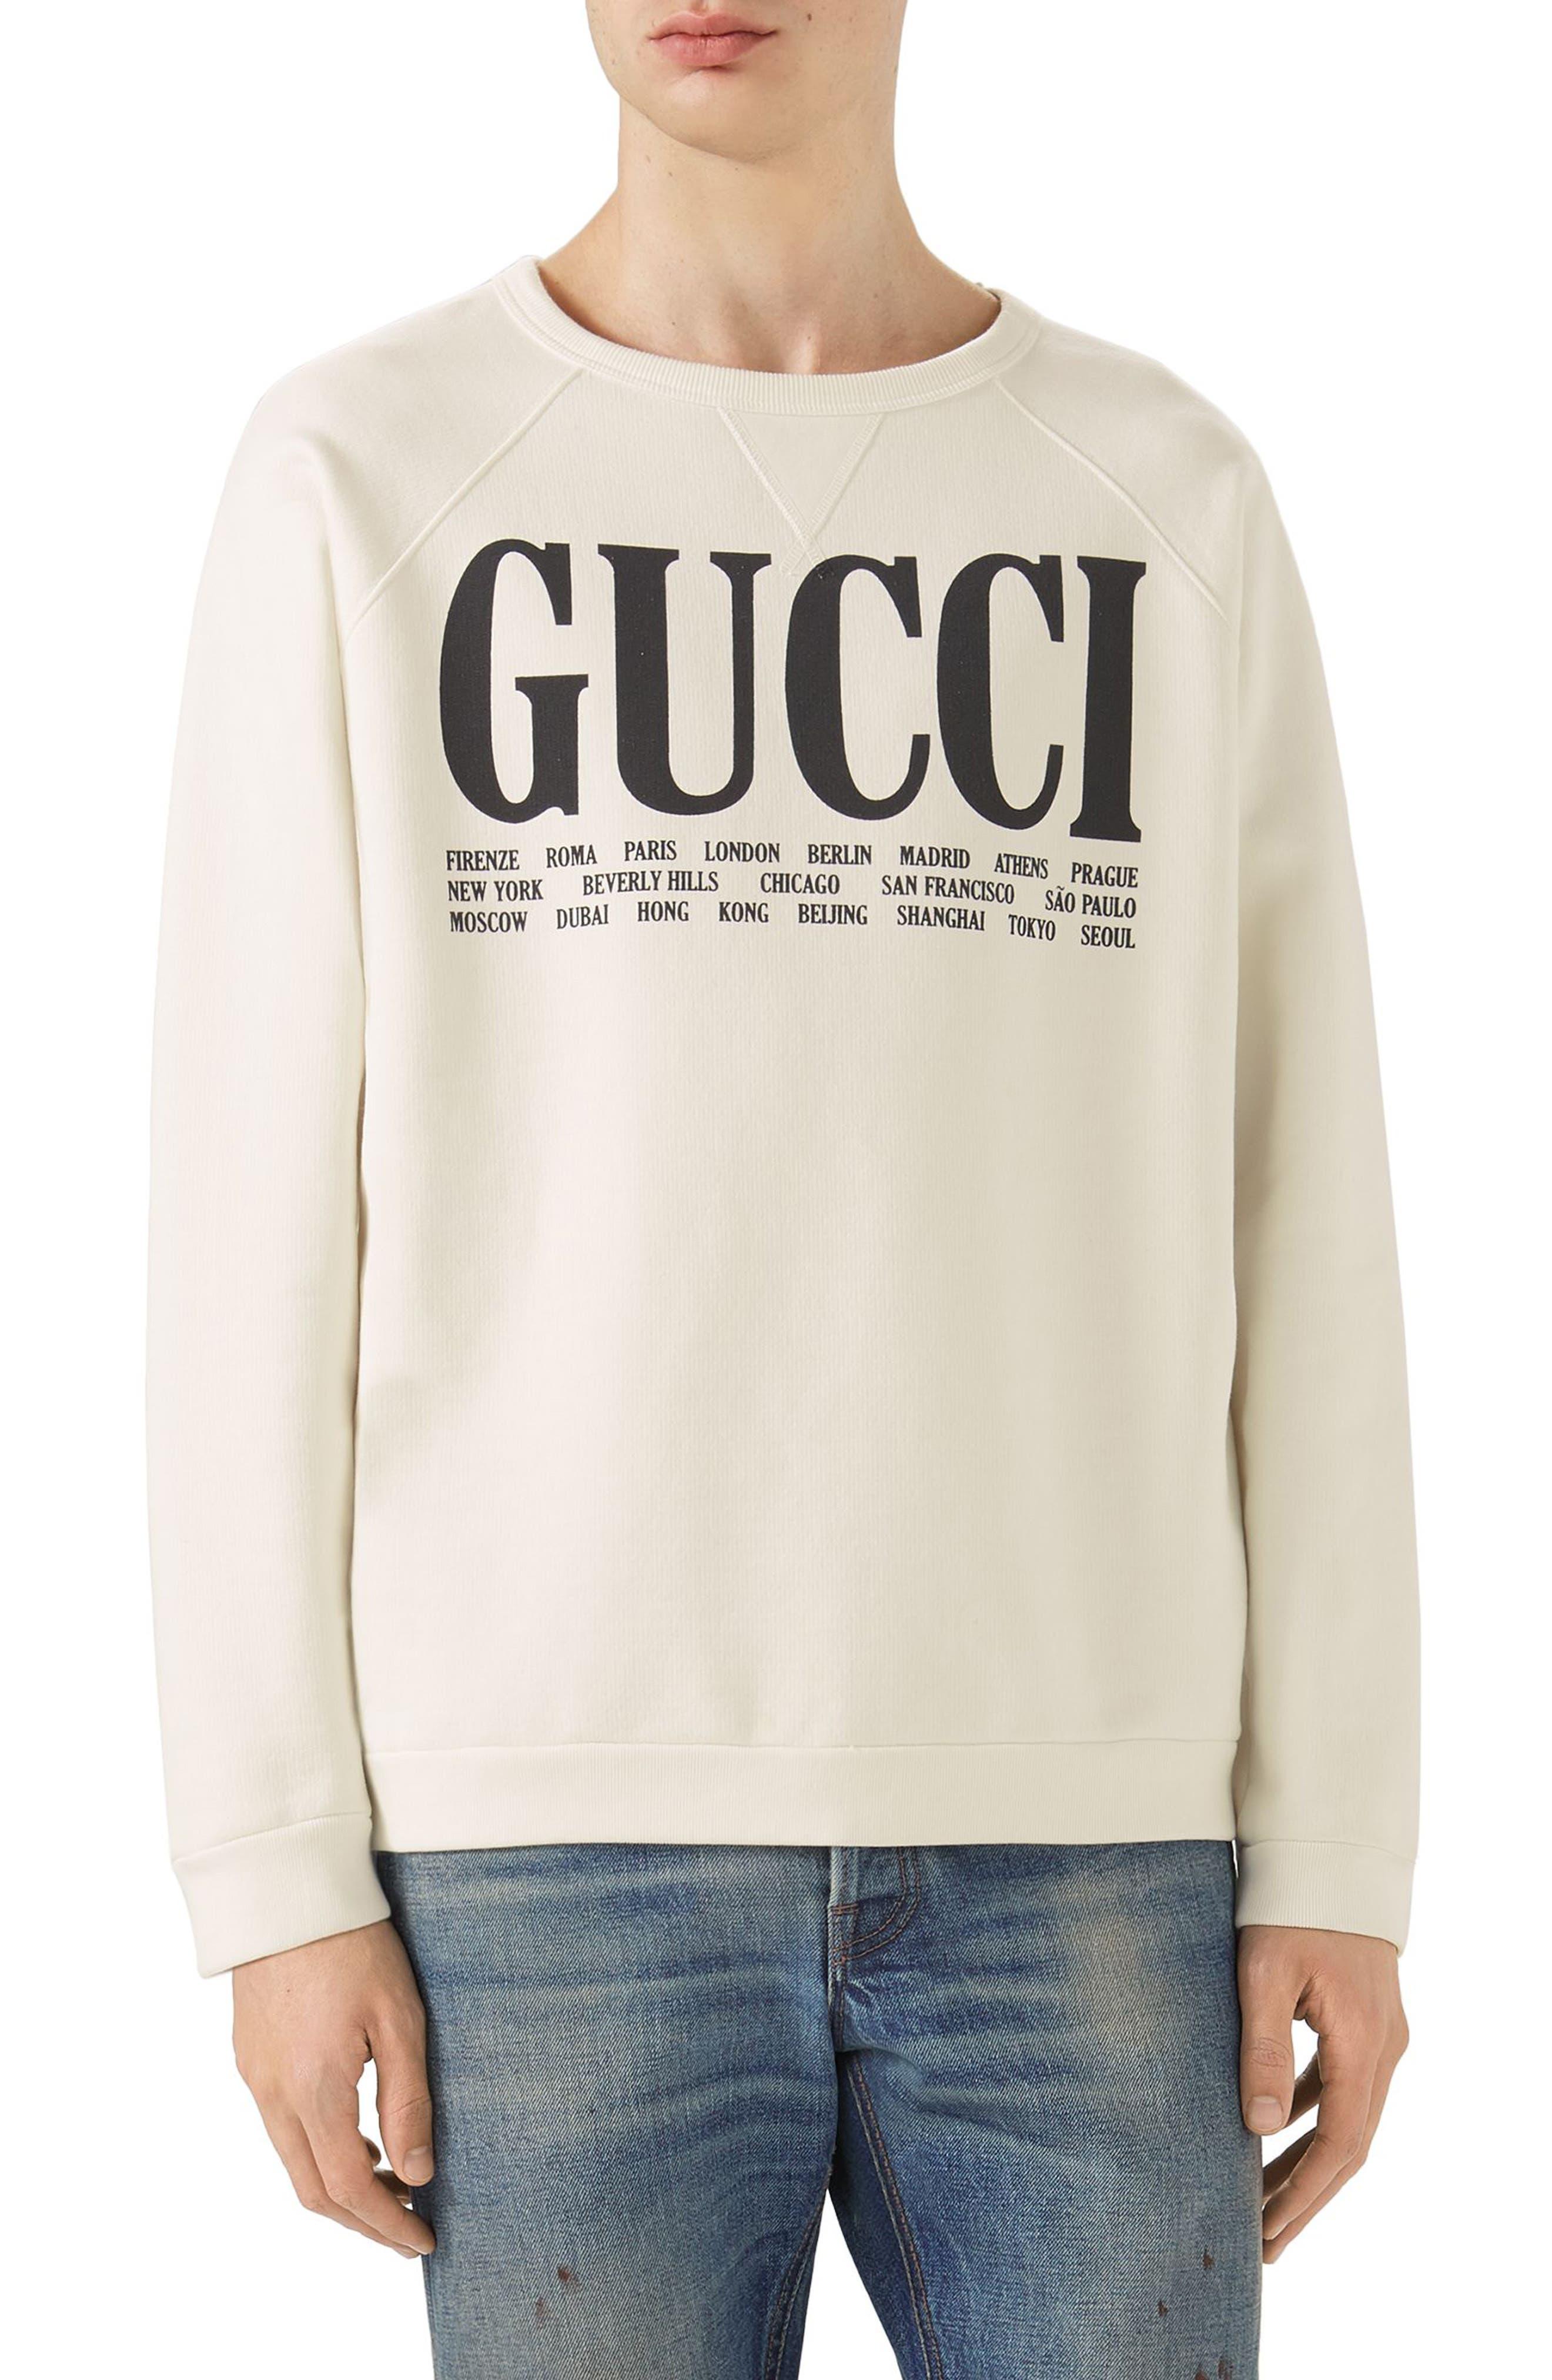 GUCCI Flagship City Graphic Sweatshirt, Main, color, 187